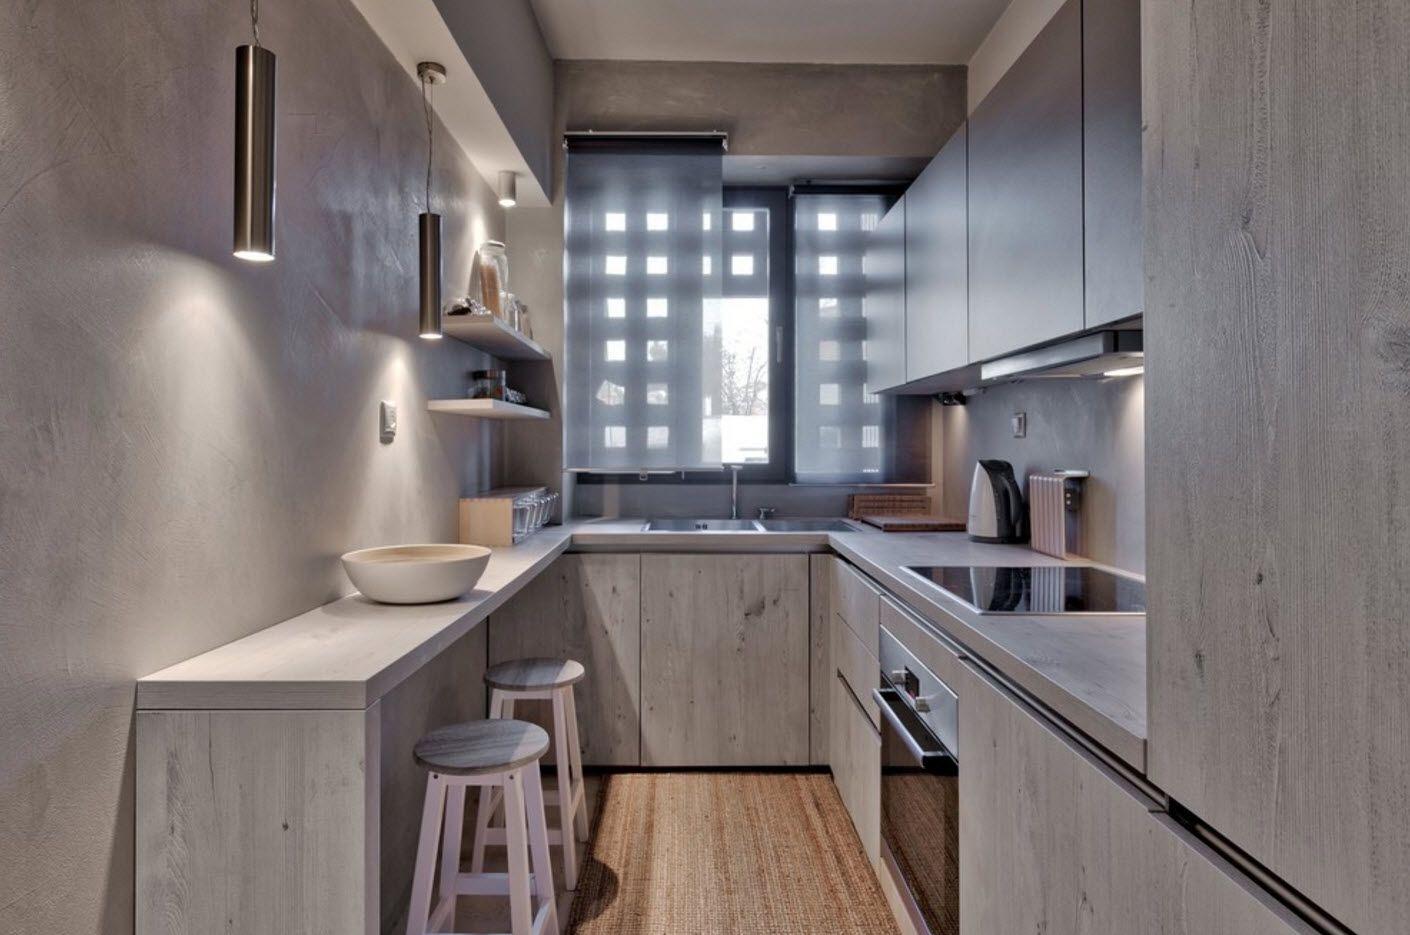 Gallet hi-tech kitchen with original blinds